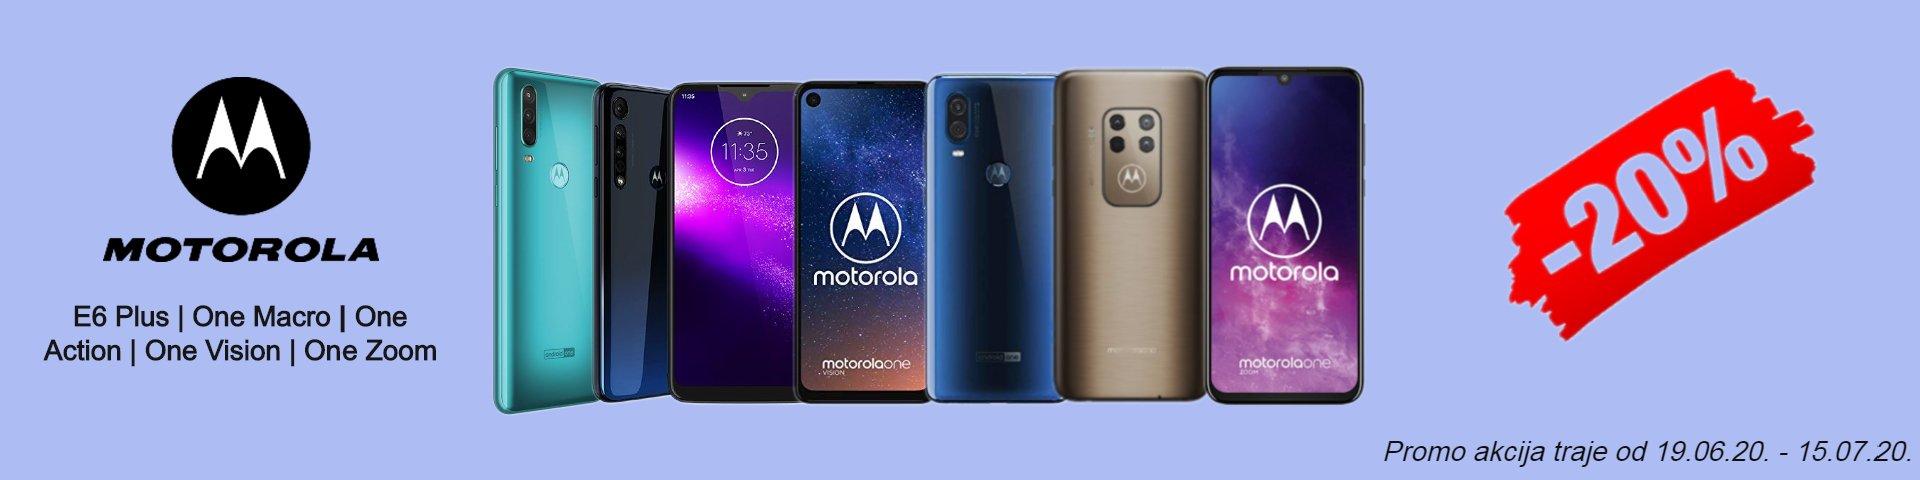 Motorola promo akcija 19.06.20. - 15.07.20.